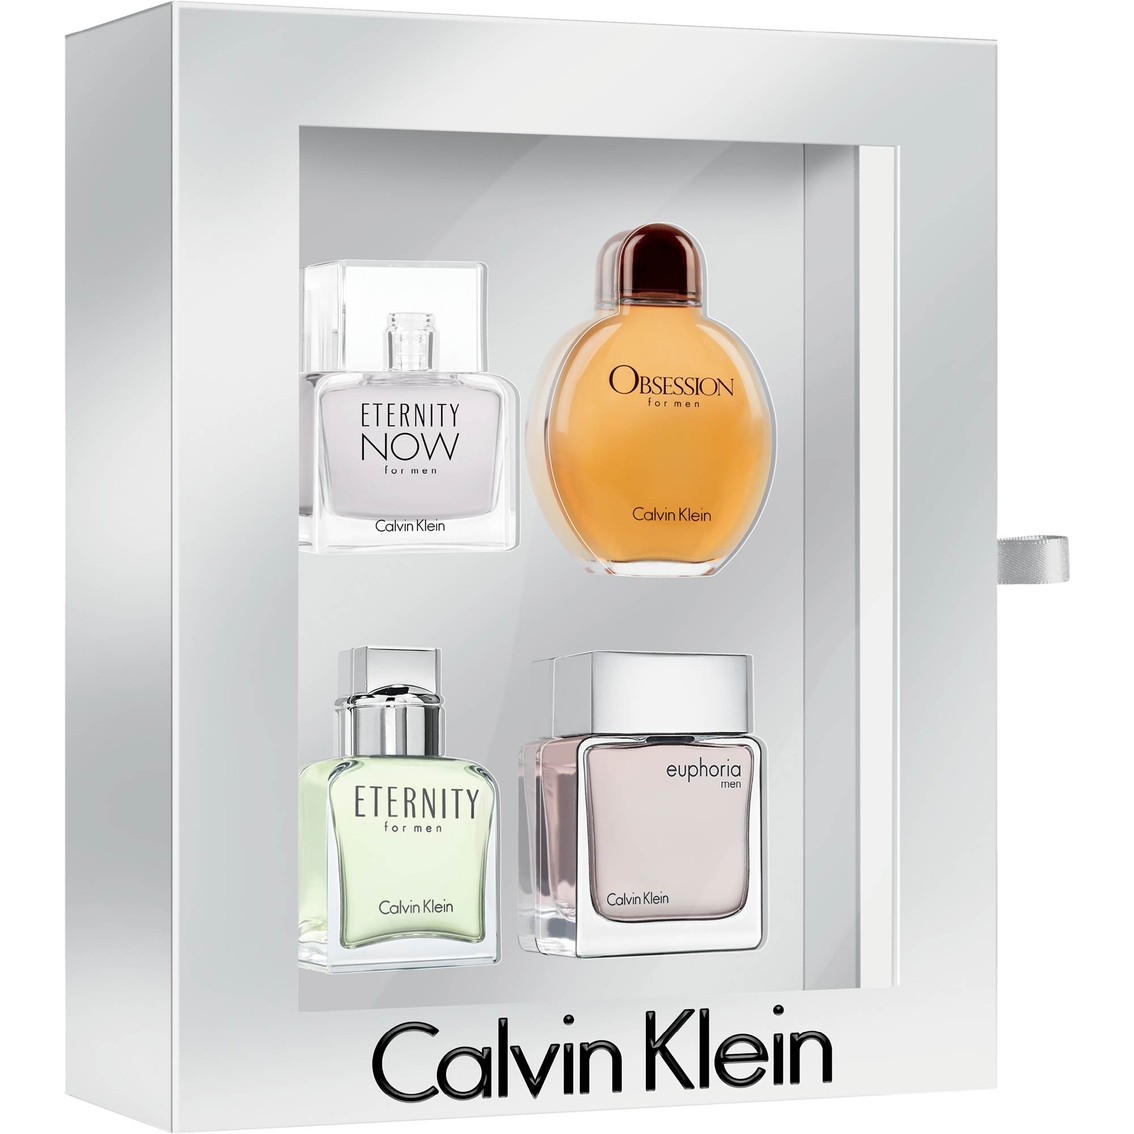 c8074f532645 Calvin Klein Corporate Coffret Set For Men